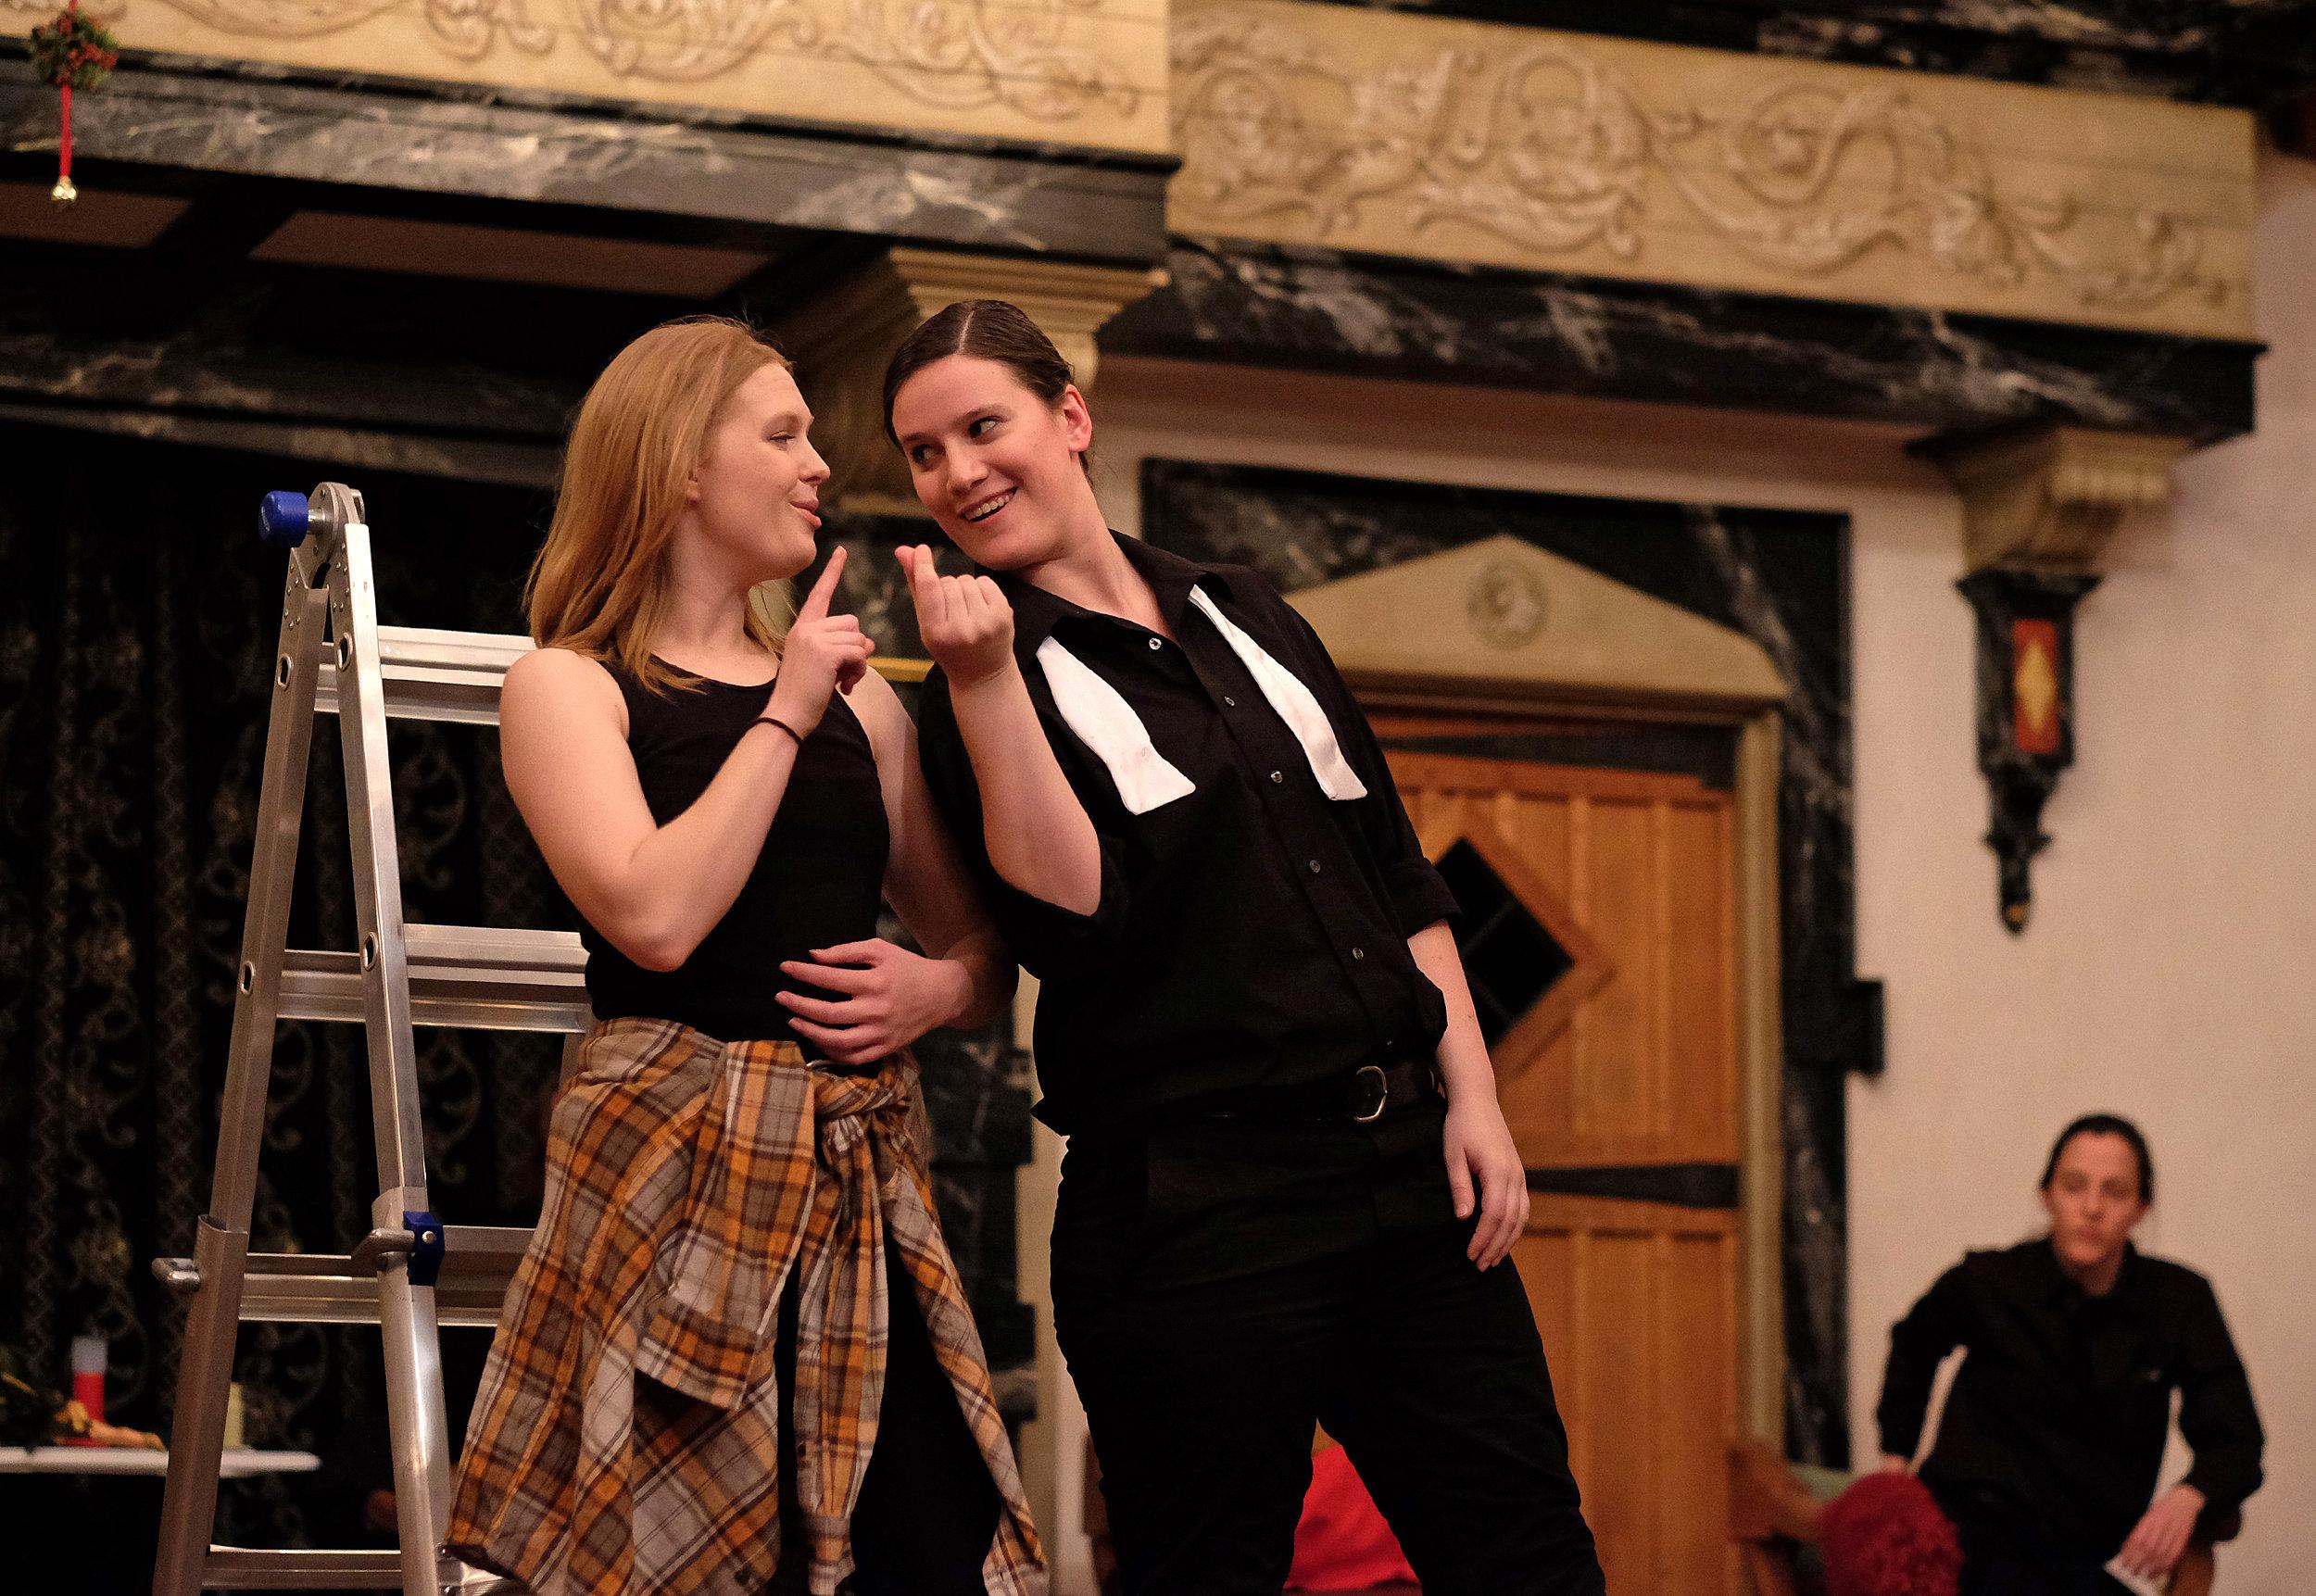 Romeo & Juliet  for Turning Glass Shakespeare  Mercutio: Amy Simpson Grubbs Romeo: Nicola Collett Photographer:  Norm Shafer